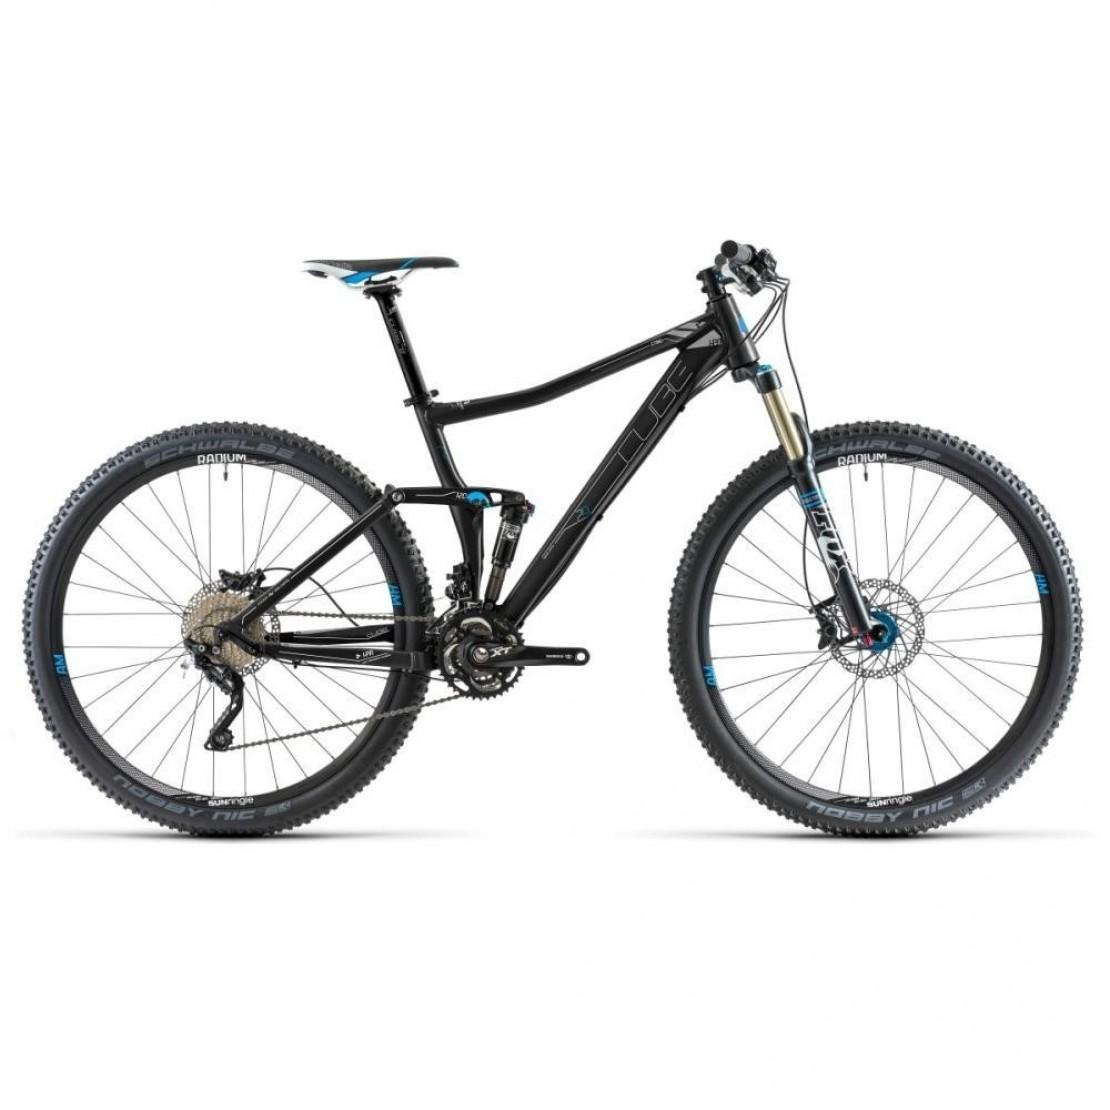 Cube Sting 120 Race 29 Mountain Bike